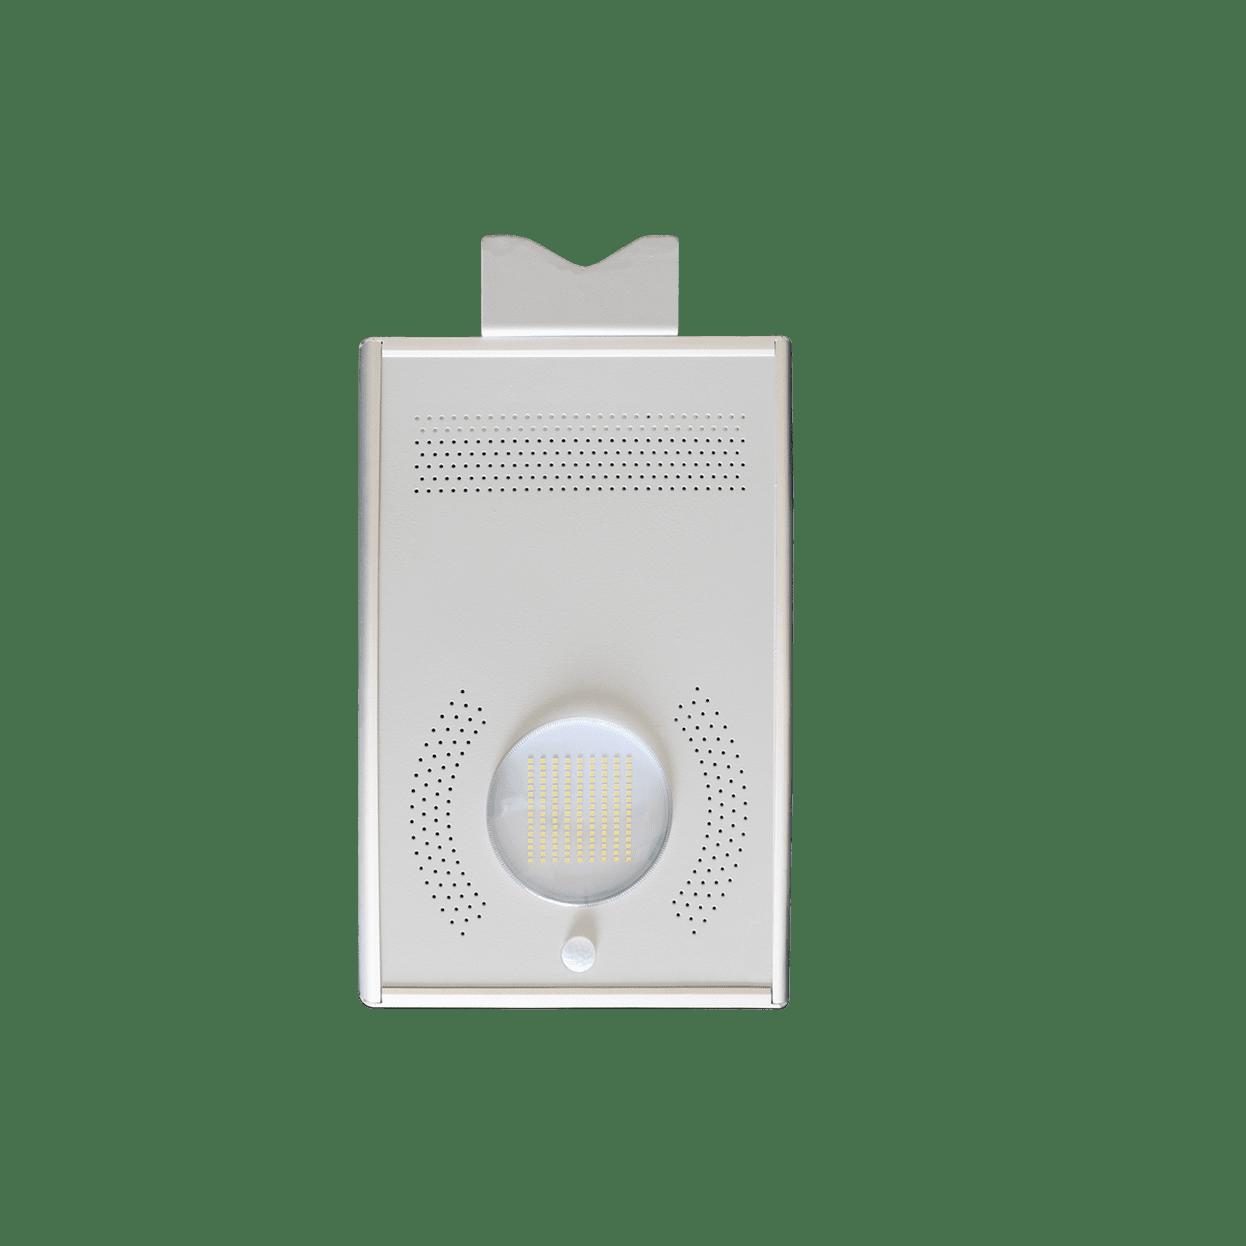 Solar Outdoor Pathway Lighting Luxman Light Supplies The Best Quality